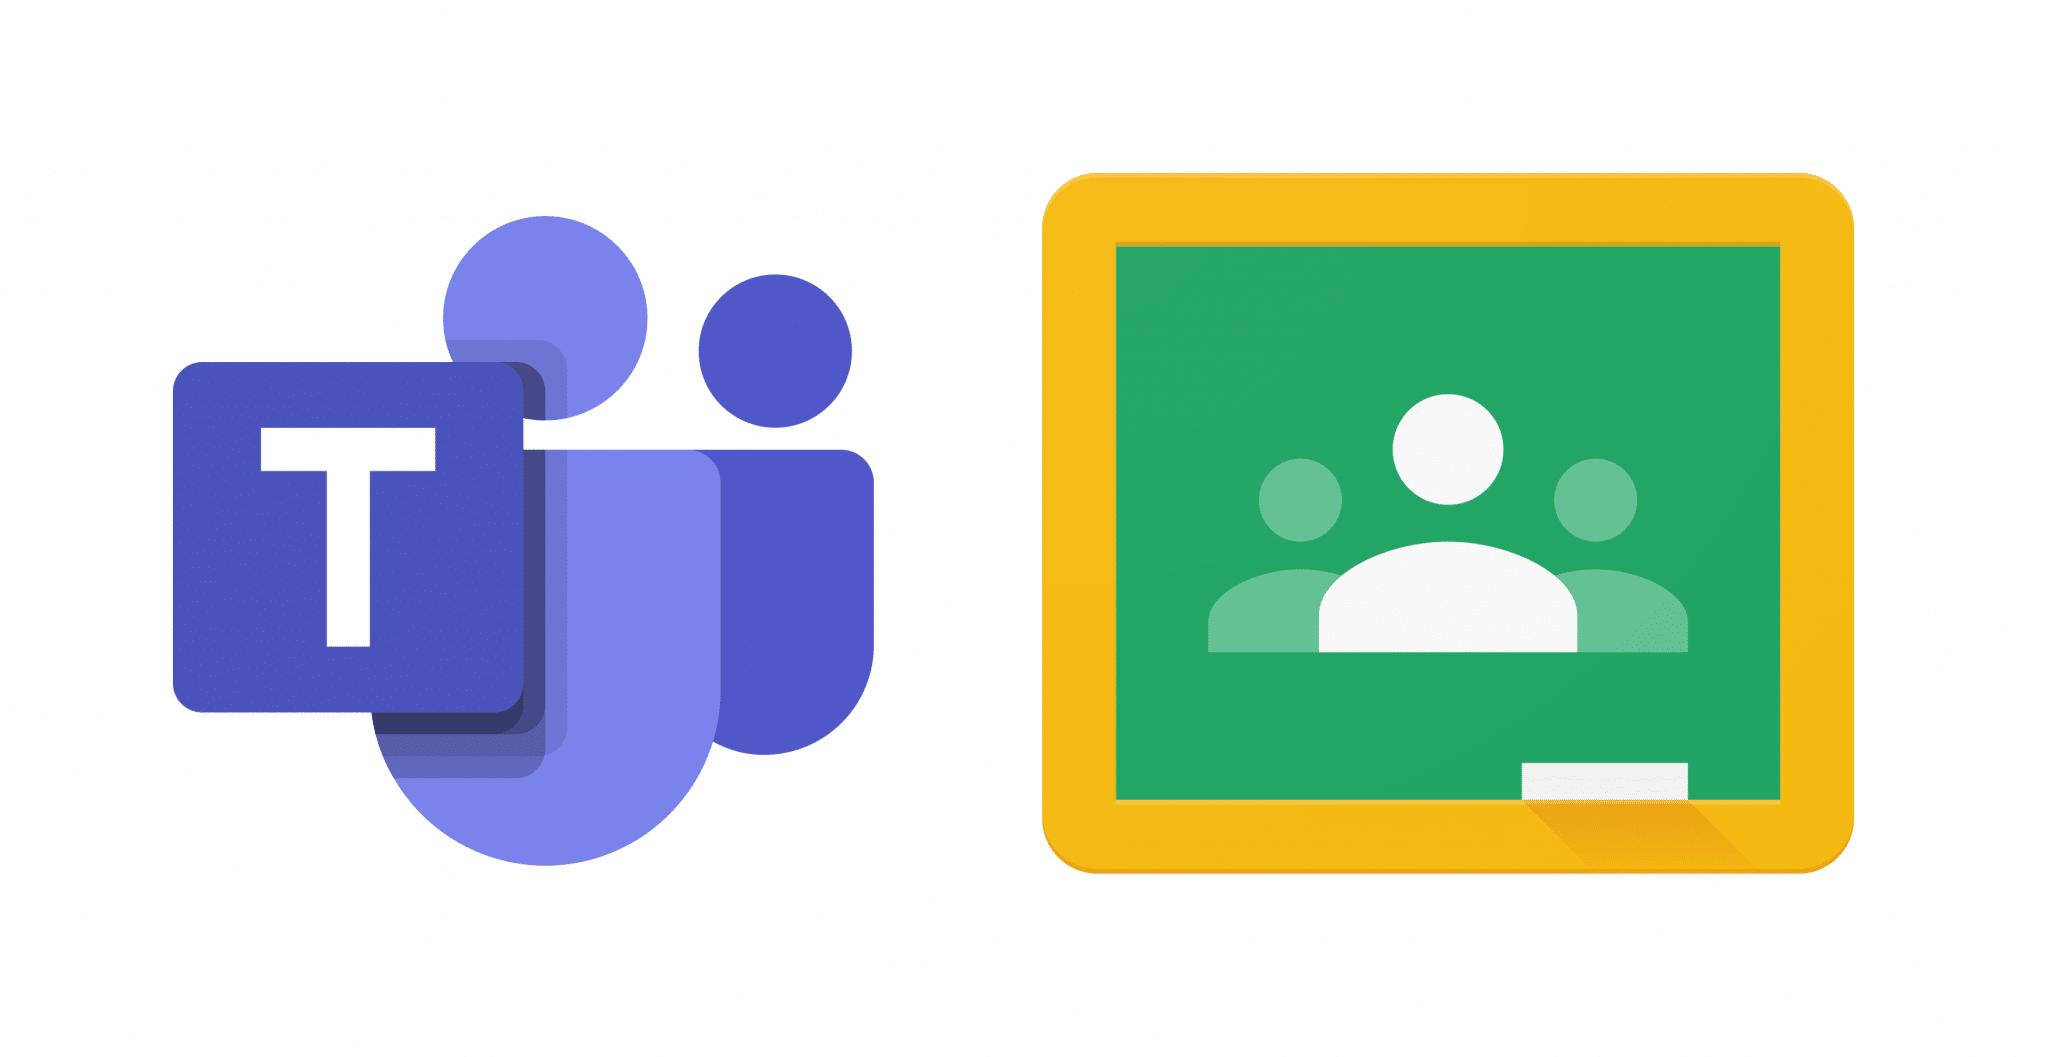 Loga Microsoft Teams a Google Classroom